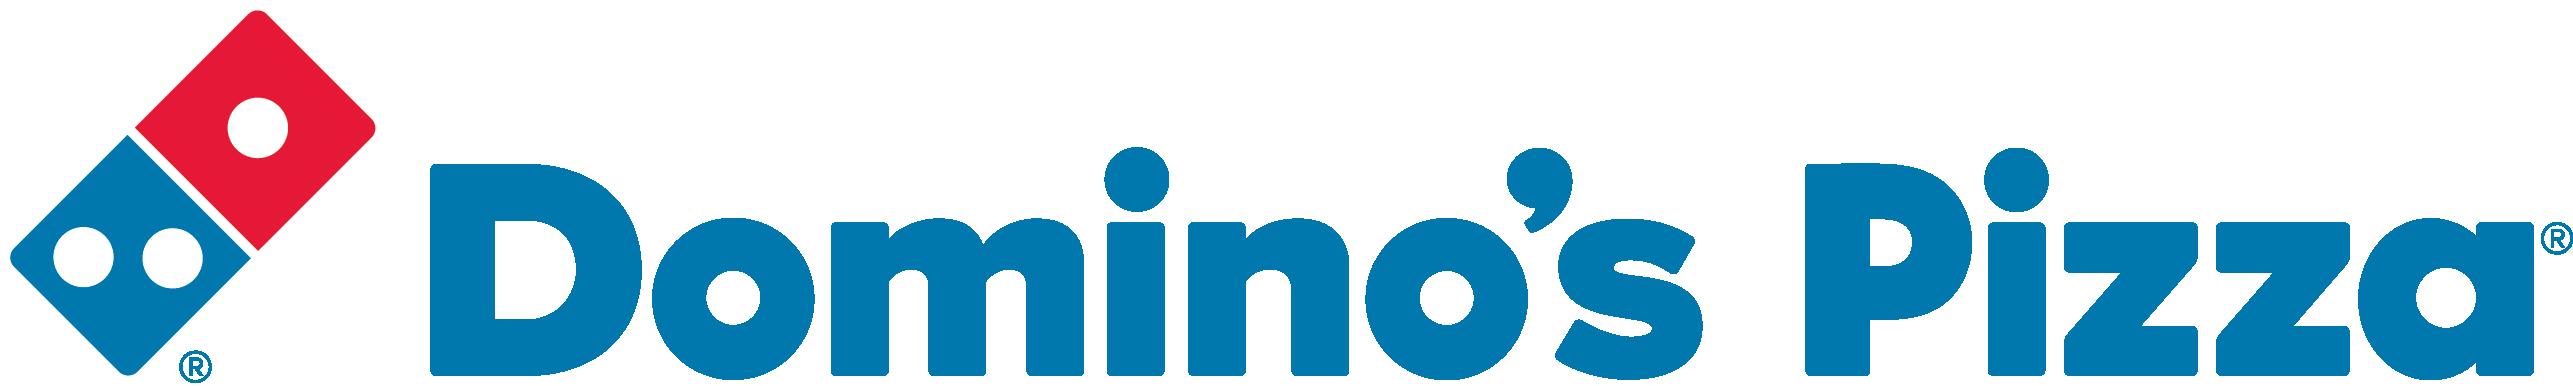 180716_DP_Intl_Logo_CMYK_Blue_Type_International_Horz_Dominos_Pizza